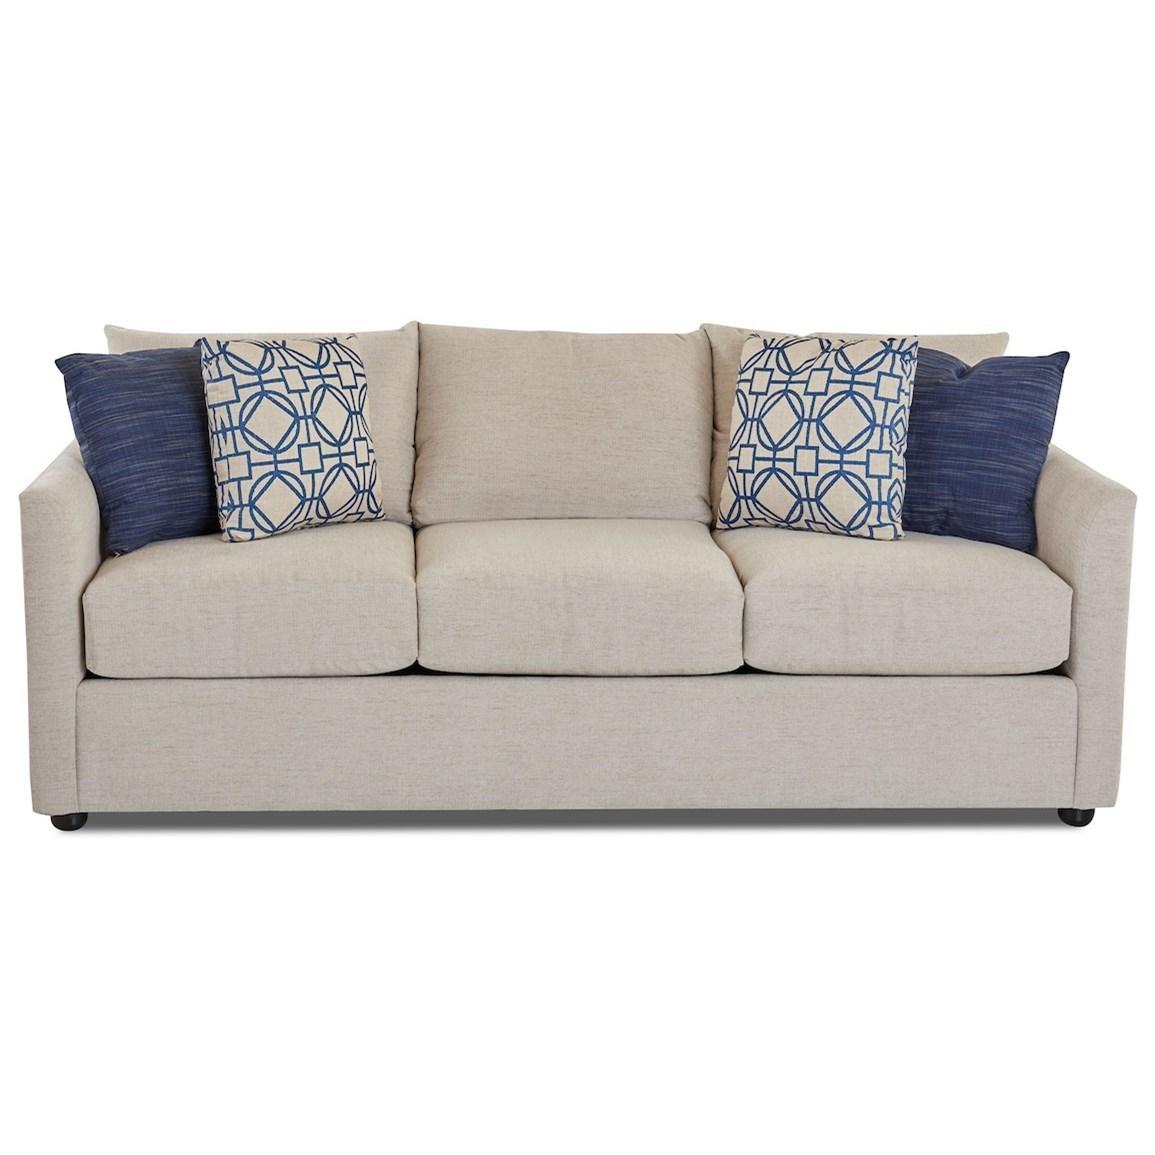 Atlanta Sleeper Sofa w/ Dreamquest Mattress by Klaussner at Johnny Janosik